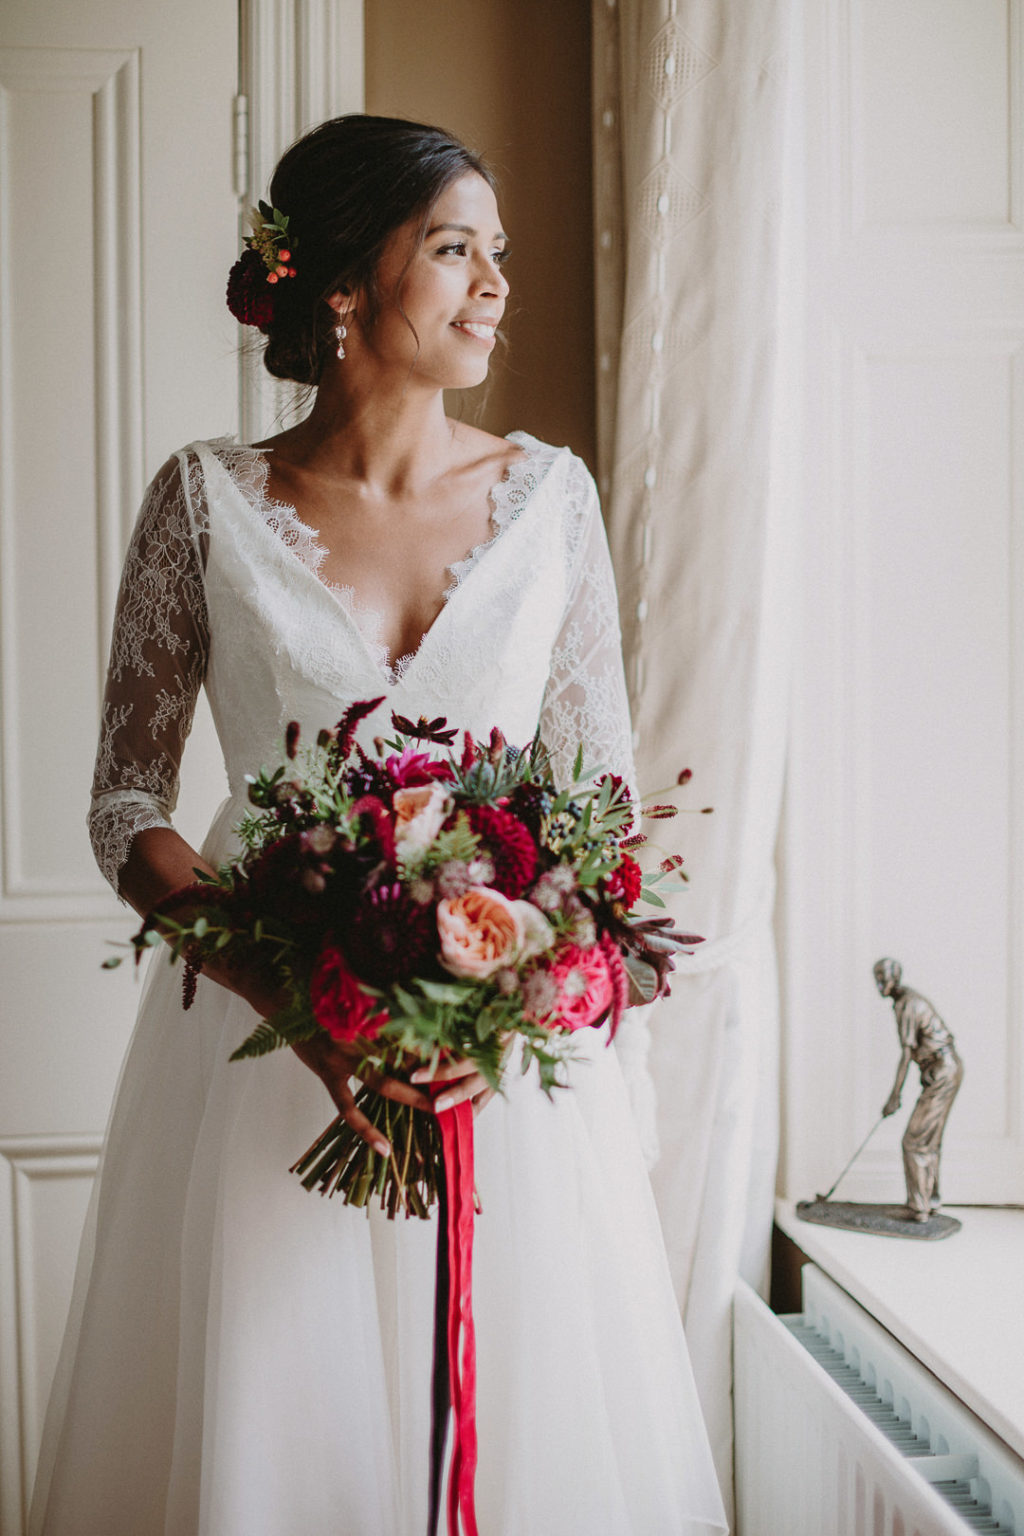 Colourful-wedding-at-Tankardstown-House-jewel-tones-Rafal-Borek-14.jpg